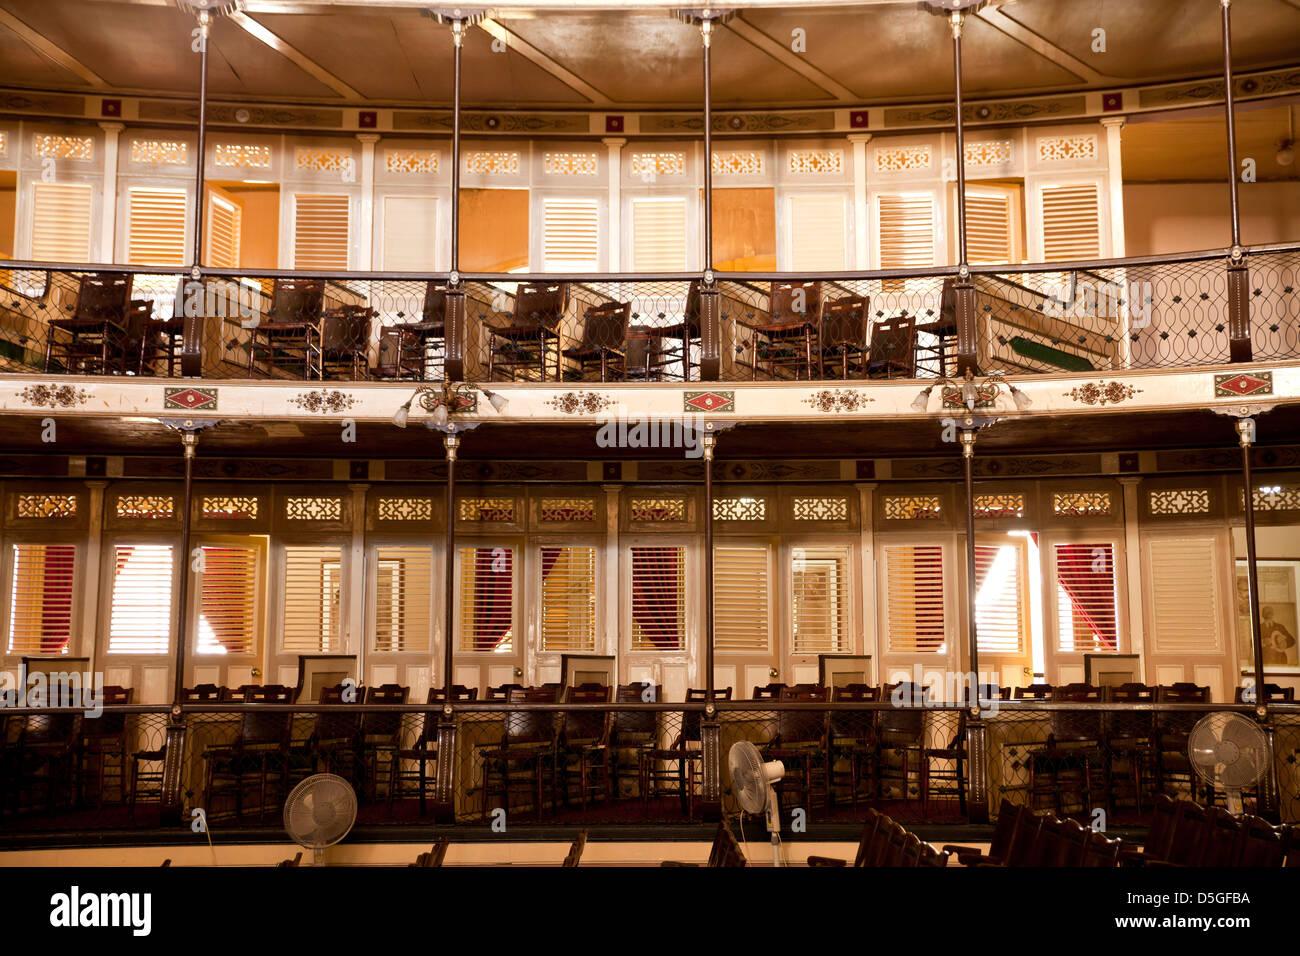 interior of the Theater Teatro Tomas Terry in Cienfuegos, Cuba, Caribbean - Stock Image